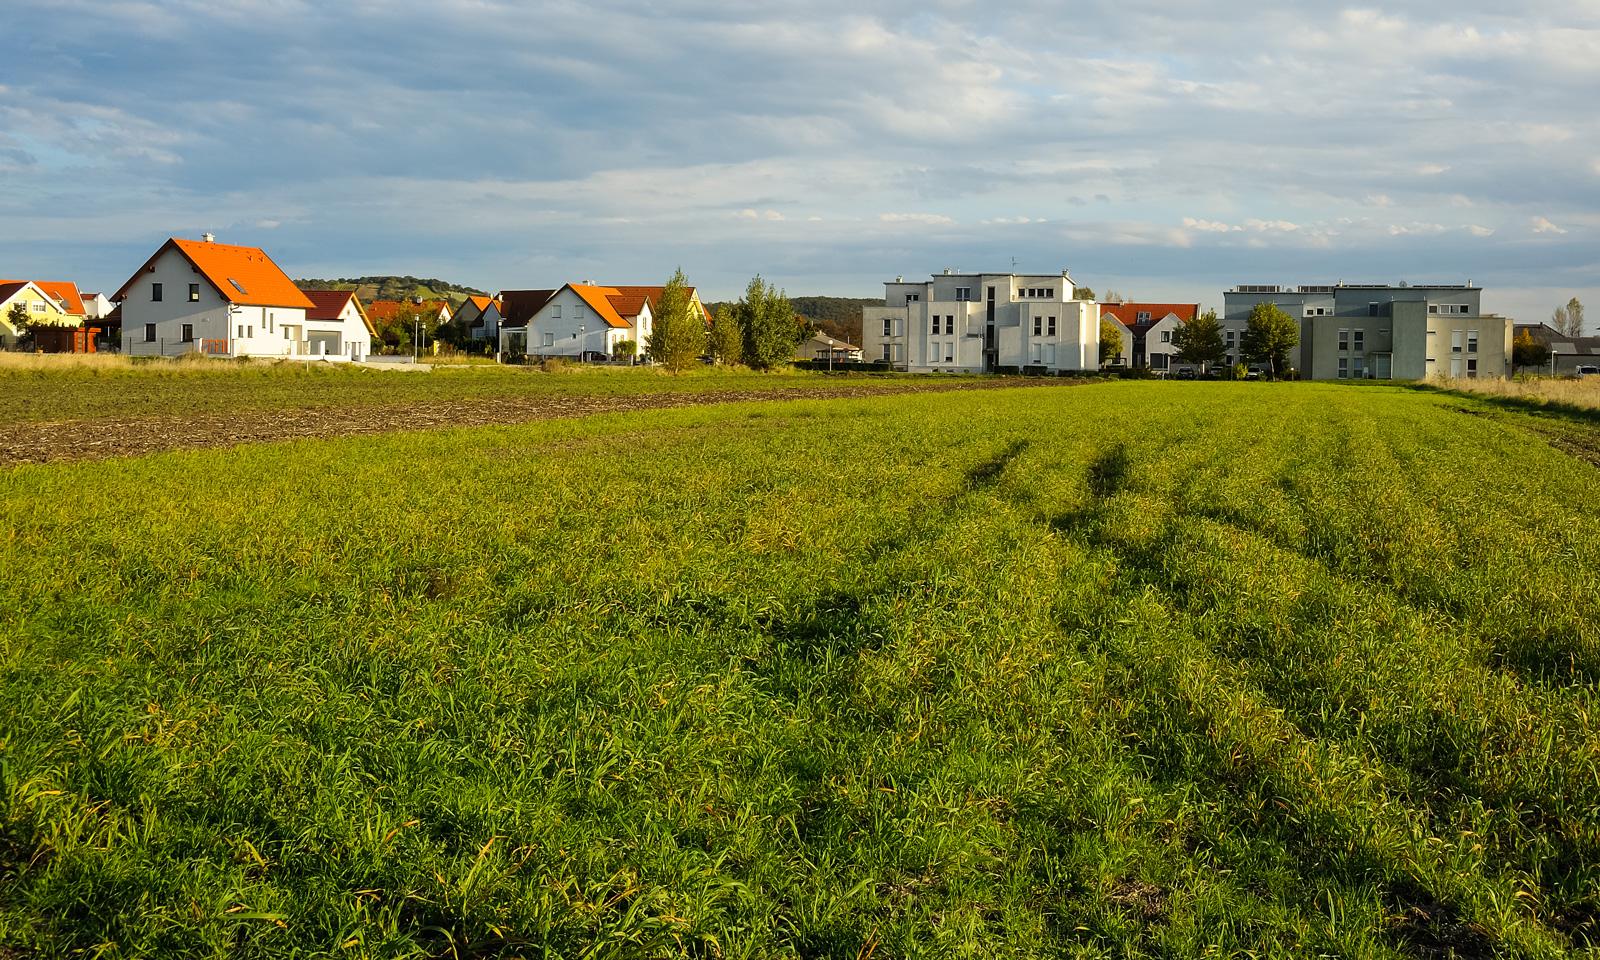 Bauland im Burgenland